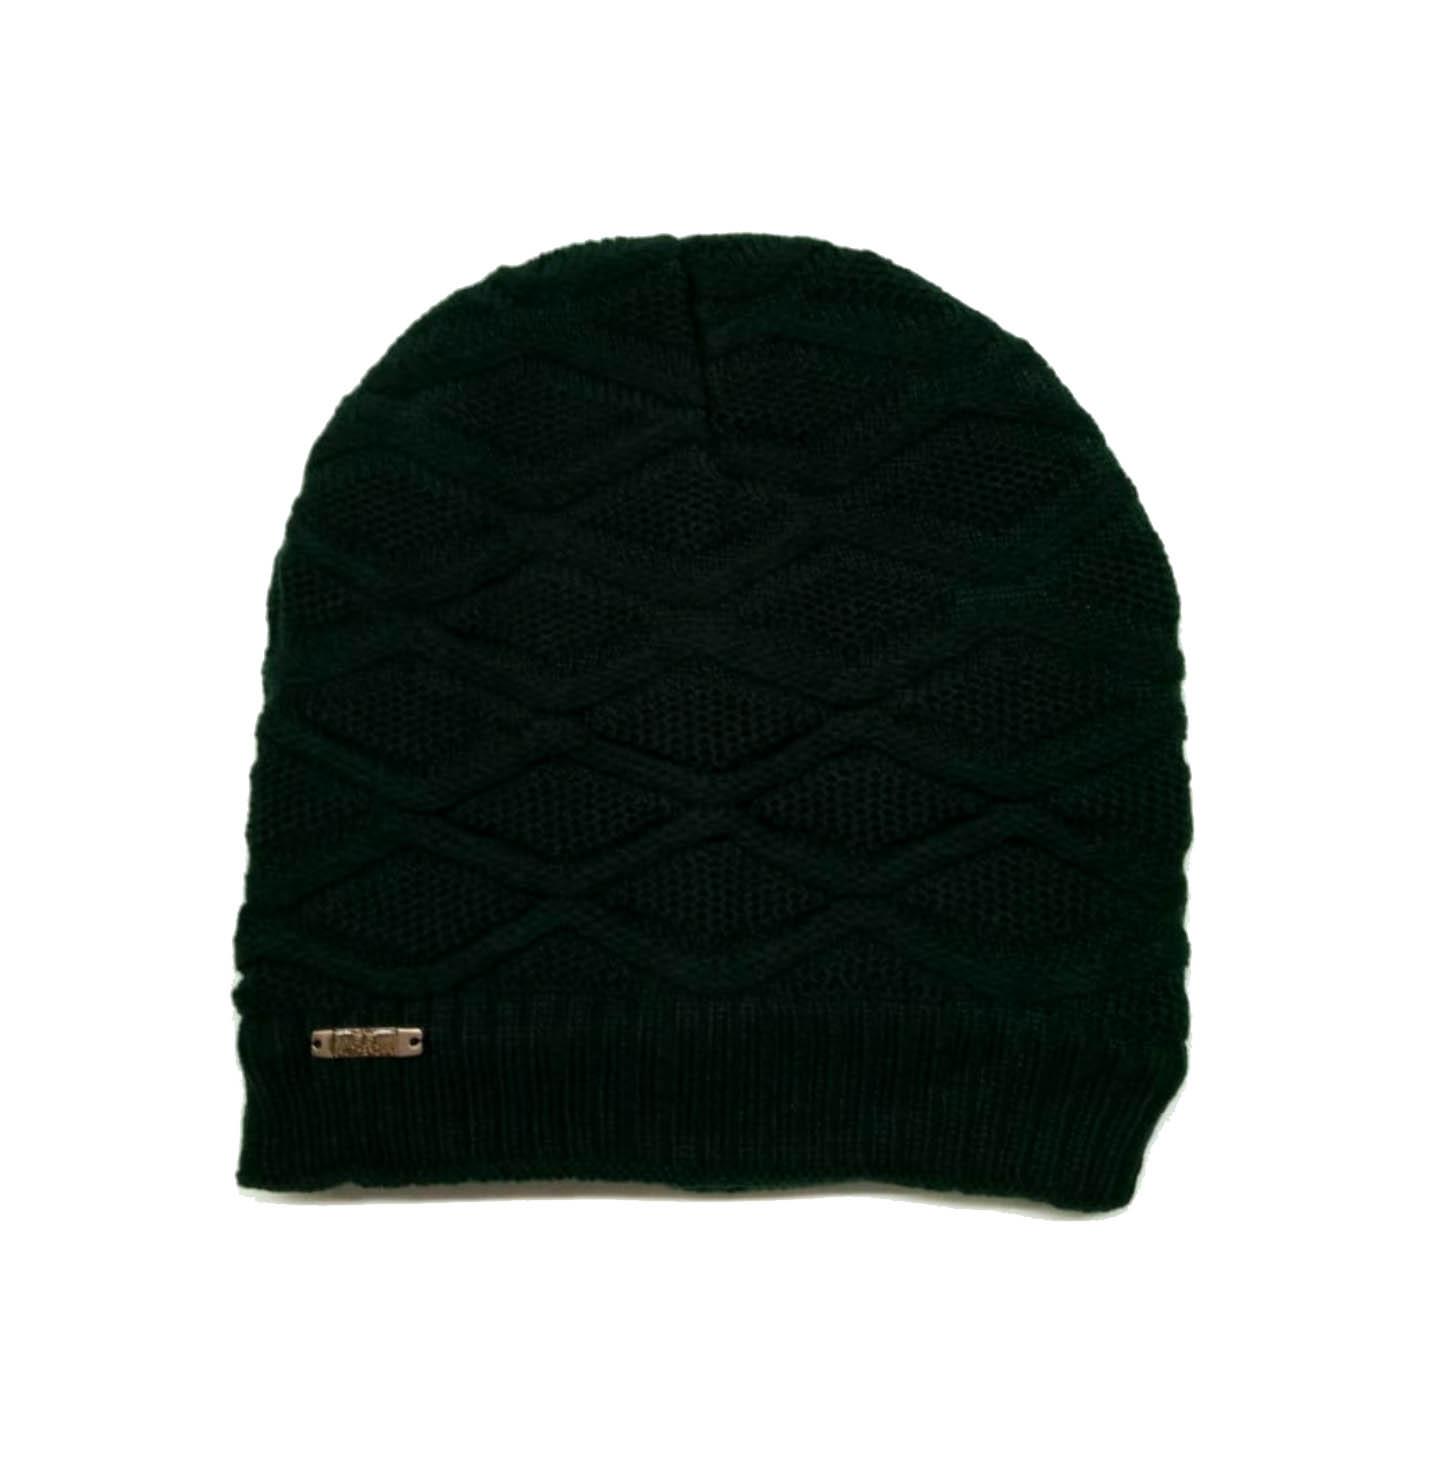 MNC JCR-GREEN MEN WINTER CAP